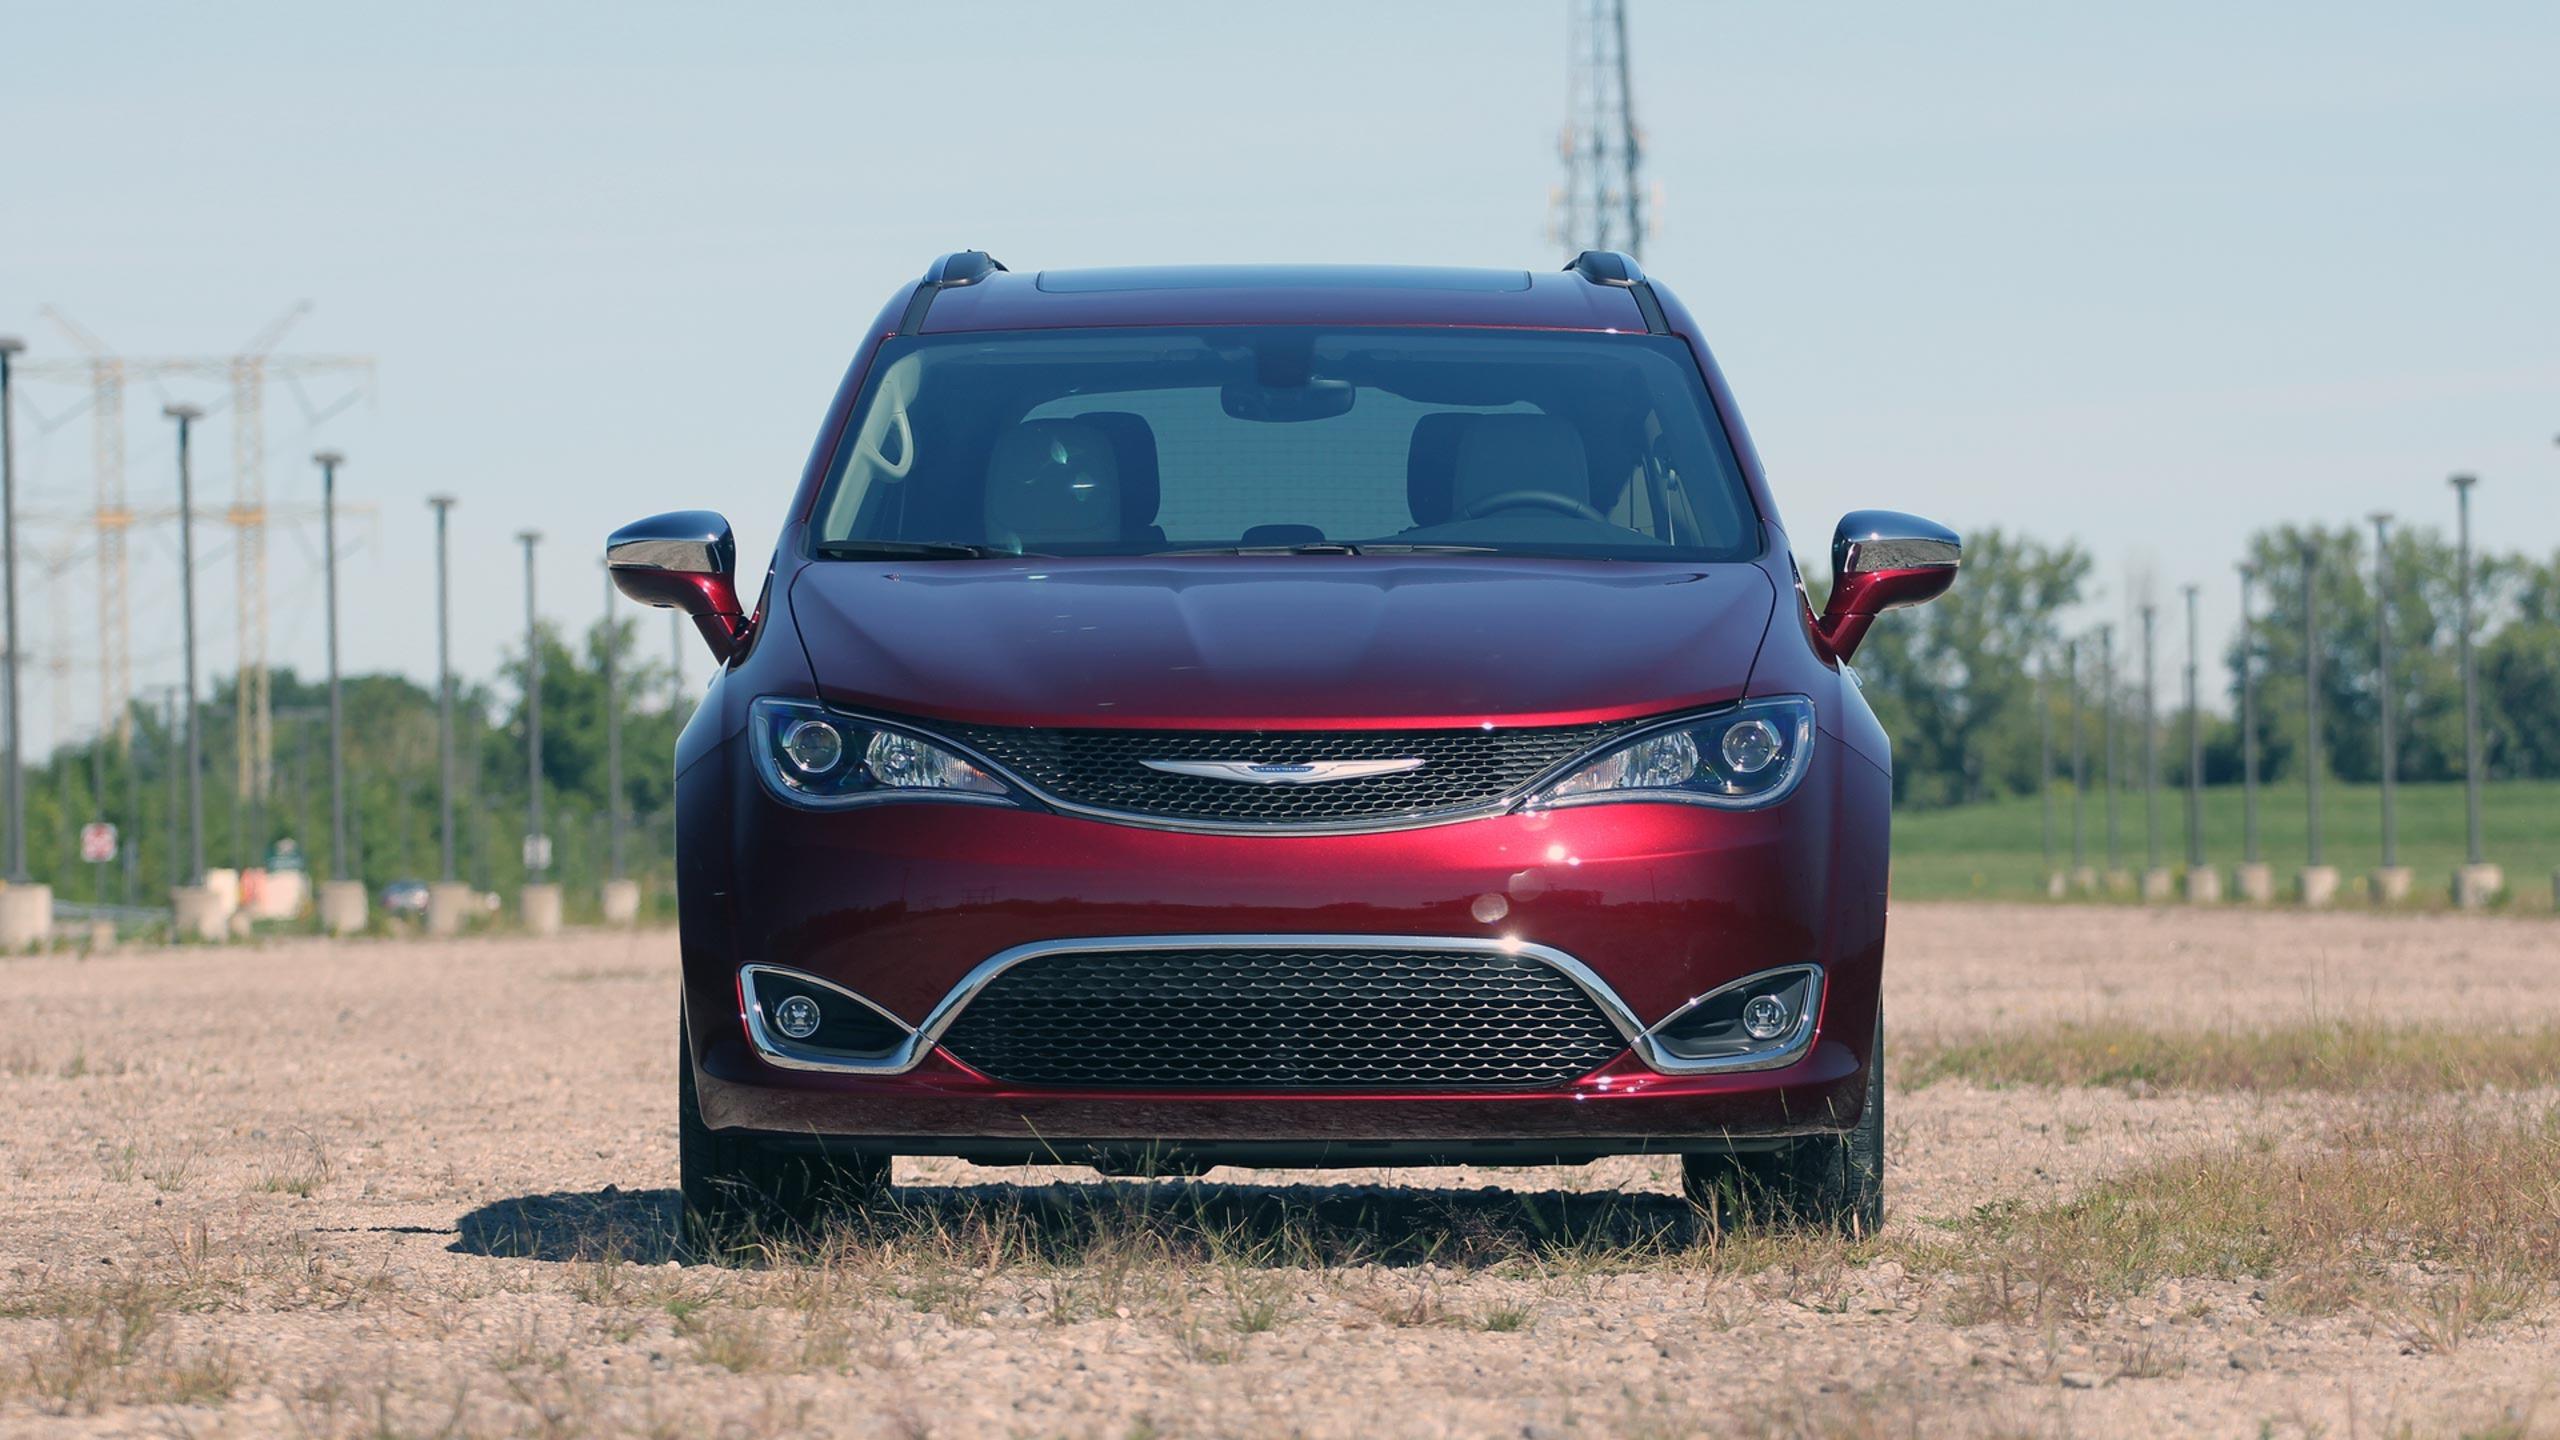 Chrysler Pacifica photo 170202